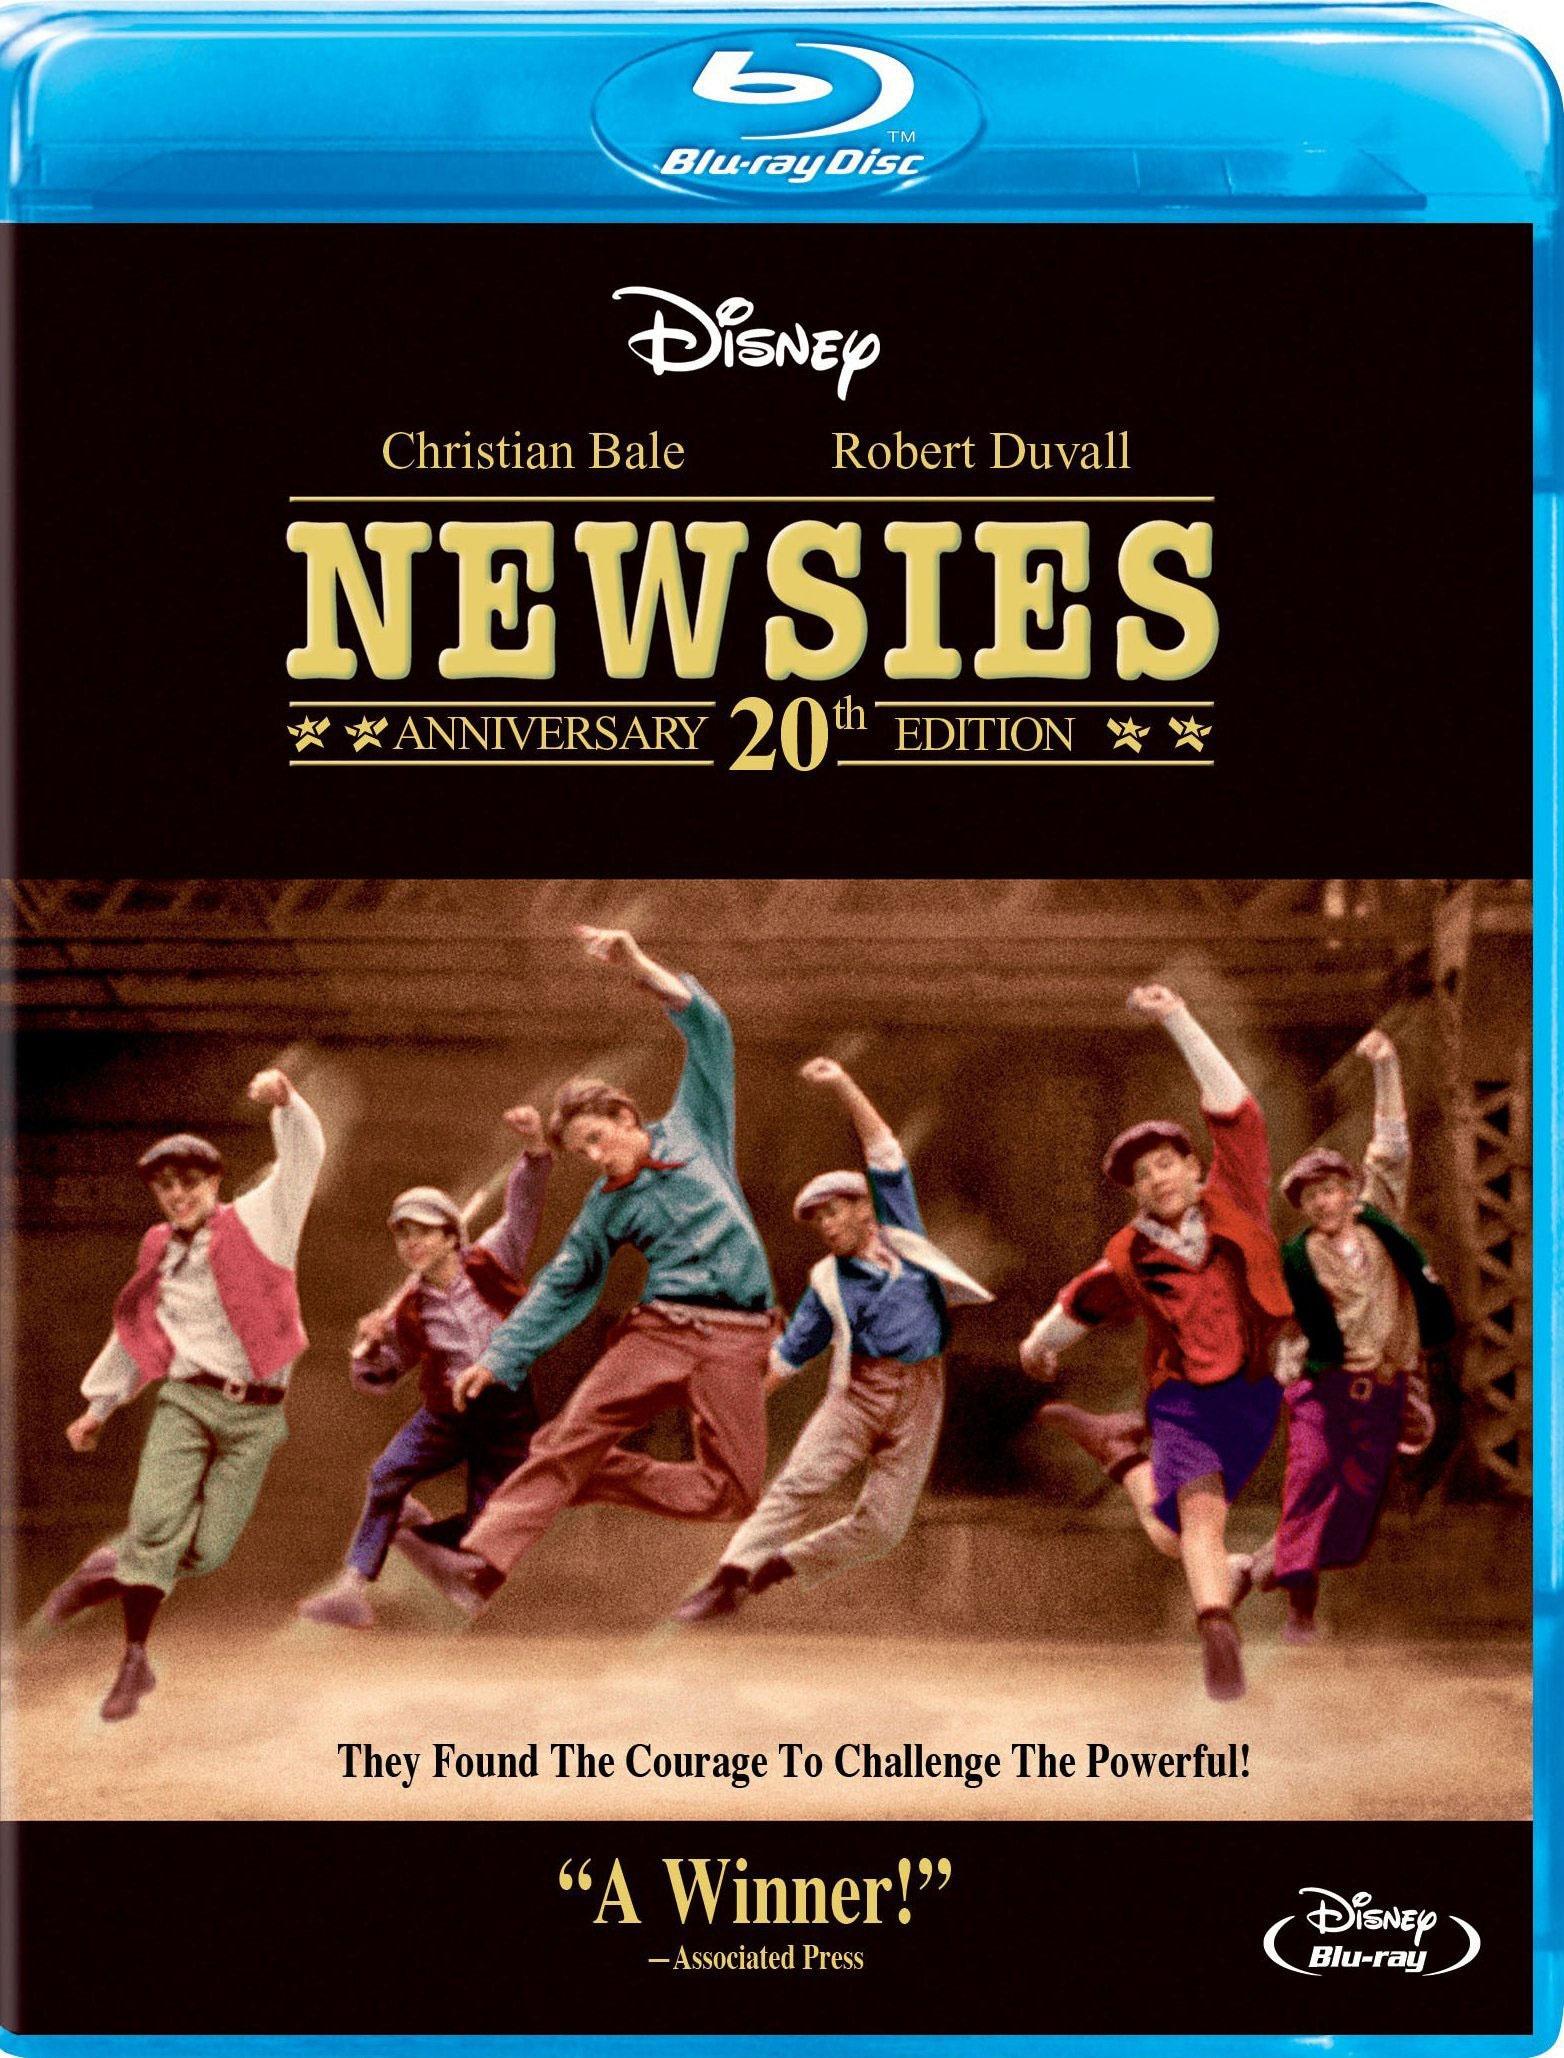 Newsies (20th Anniversary Edition) (Blu-ray Disc)